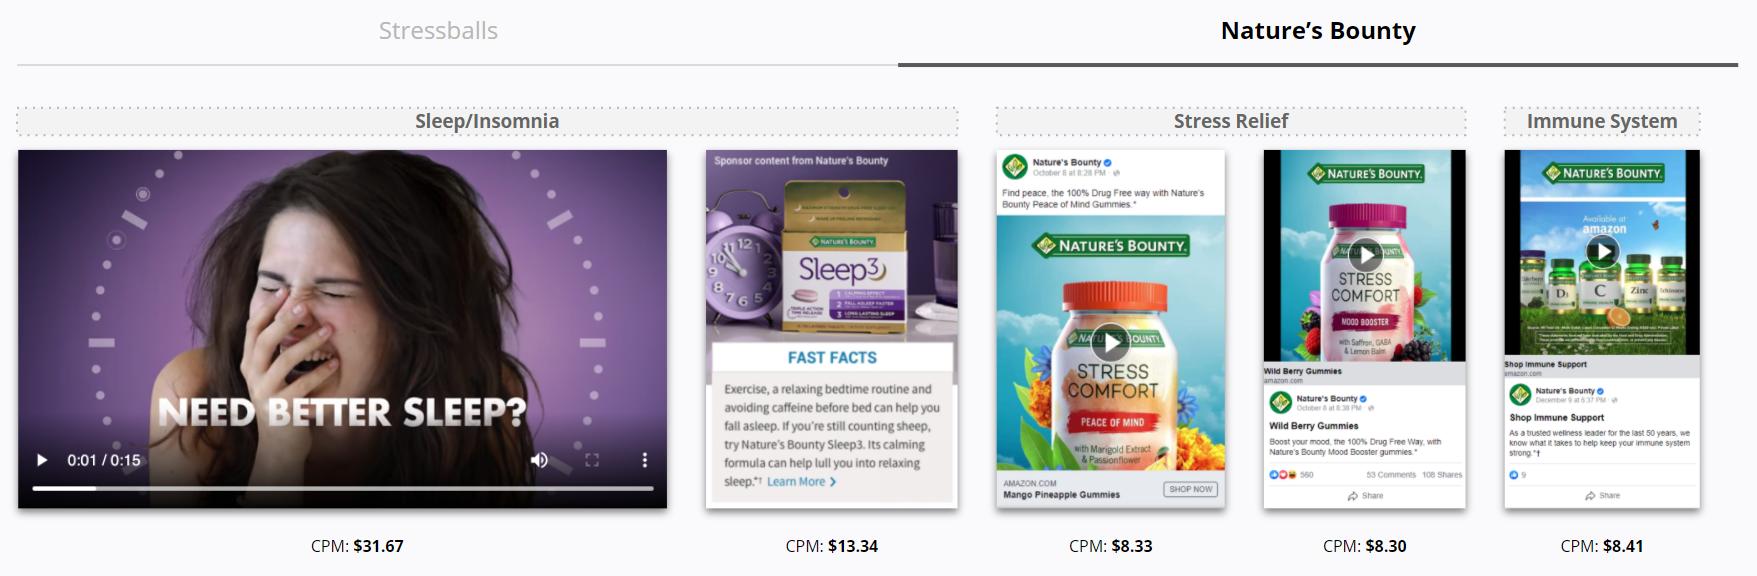 Nature's Bounty - Seasonal Ads - Sleep Insomnia - Stress Relief - Immune System